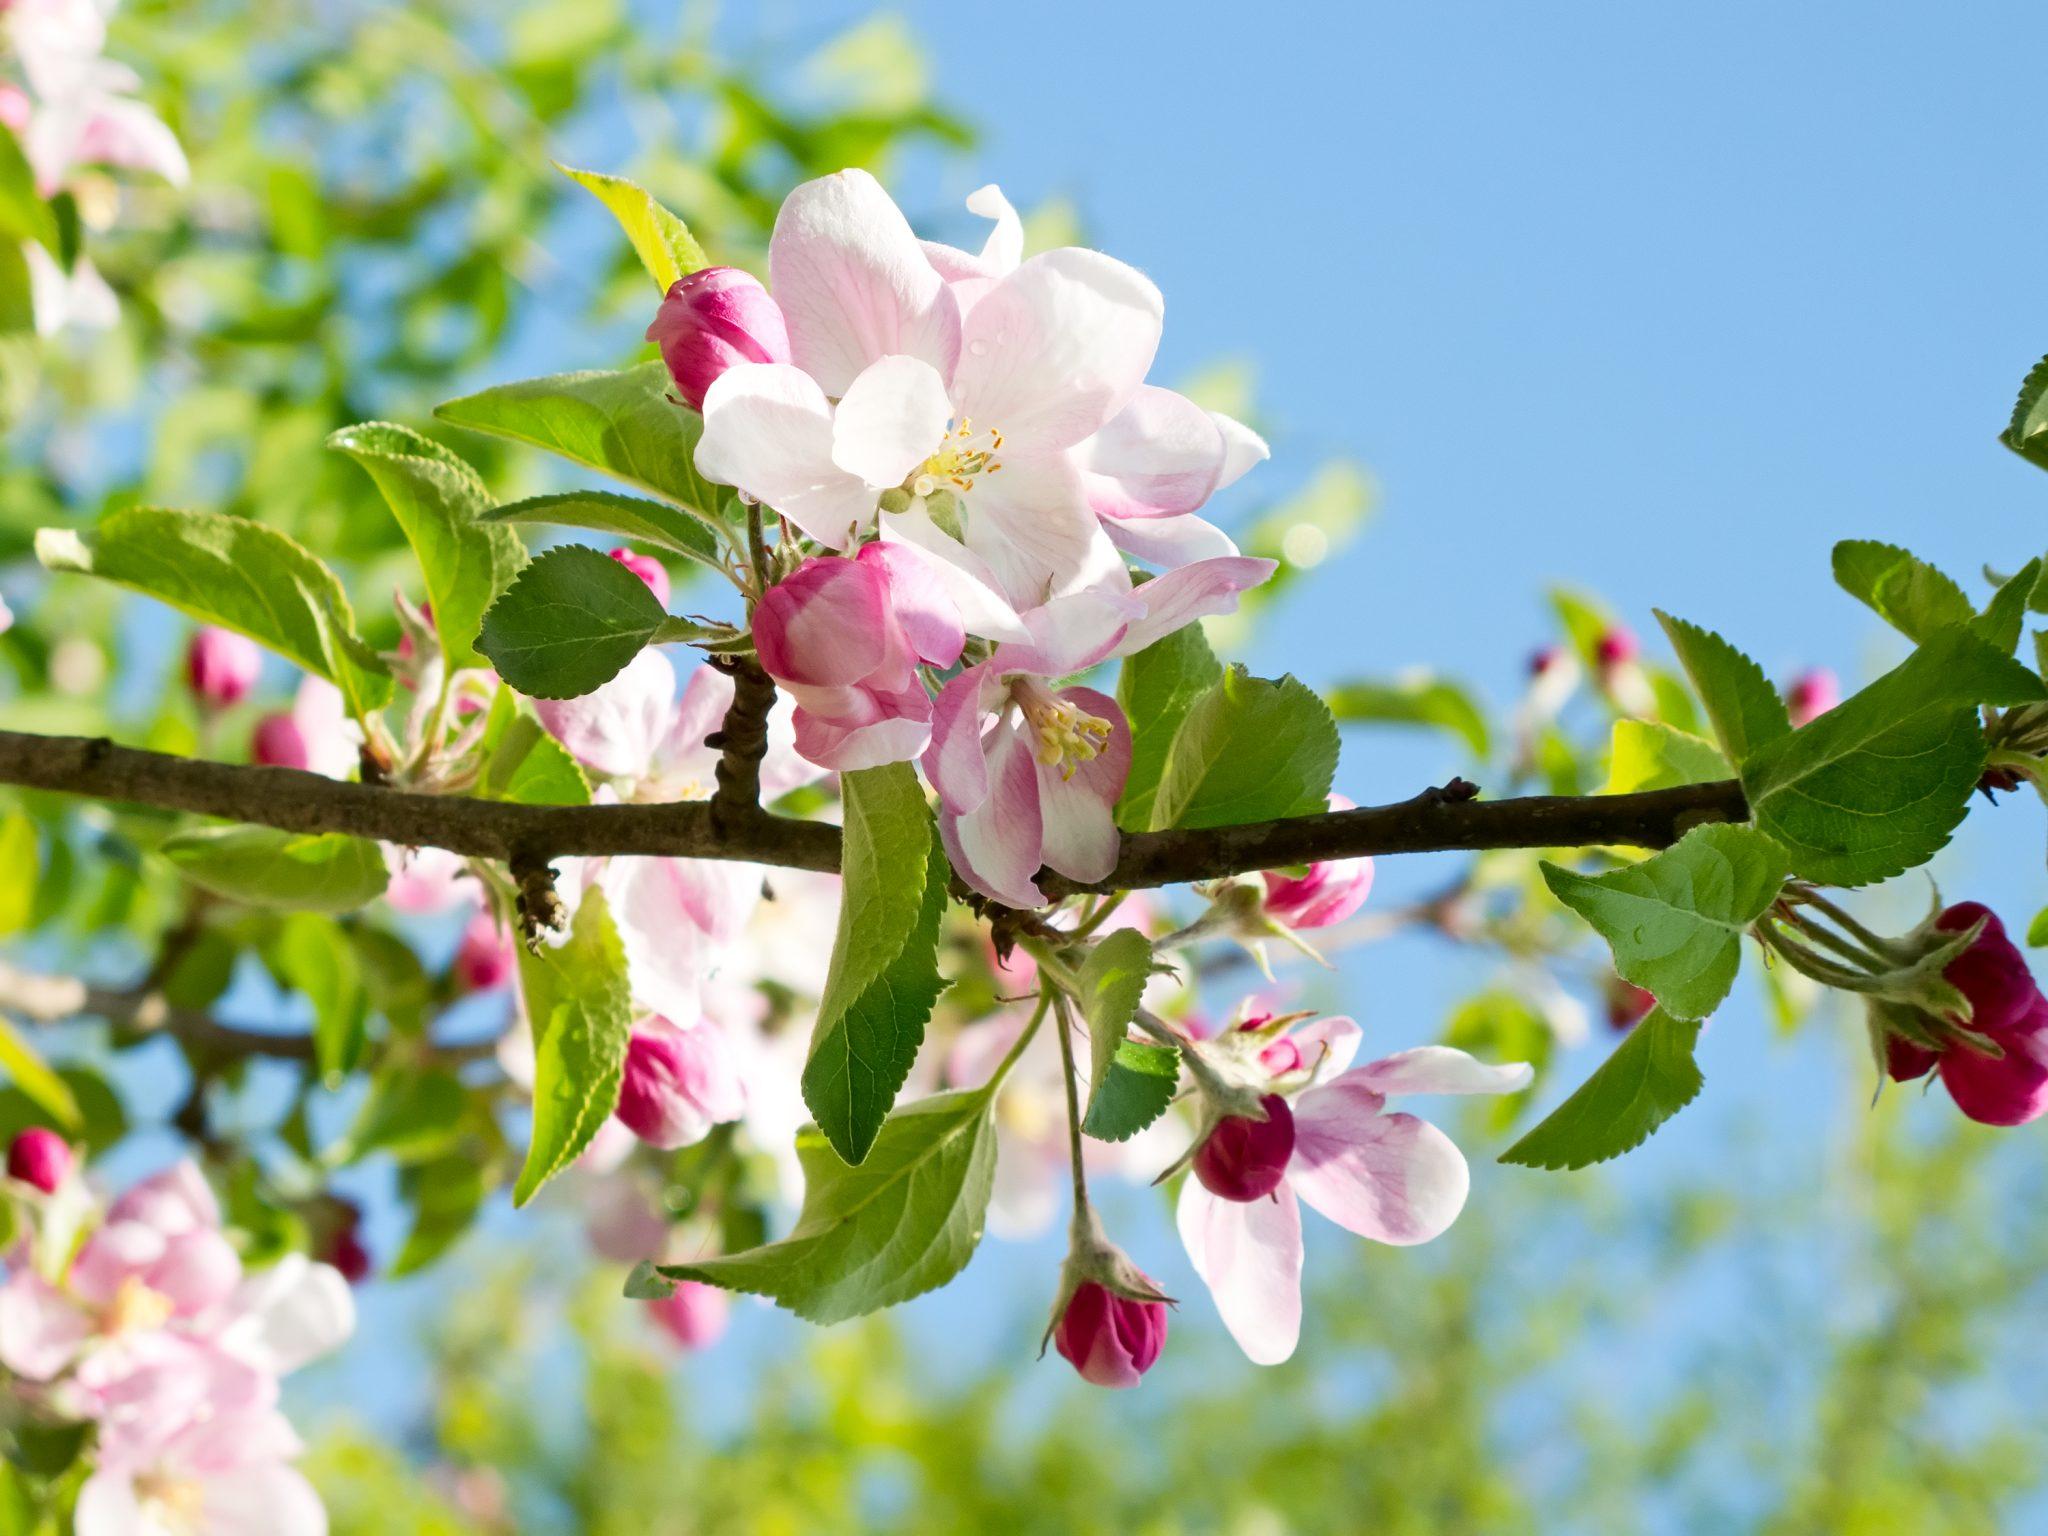 COLOURBOX3363716 Forår Blomst